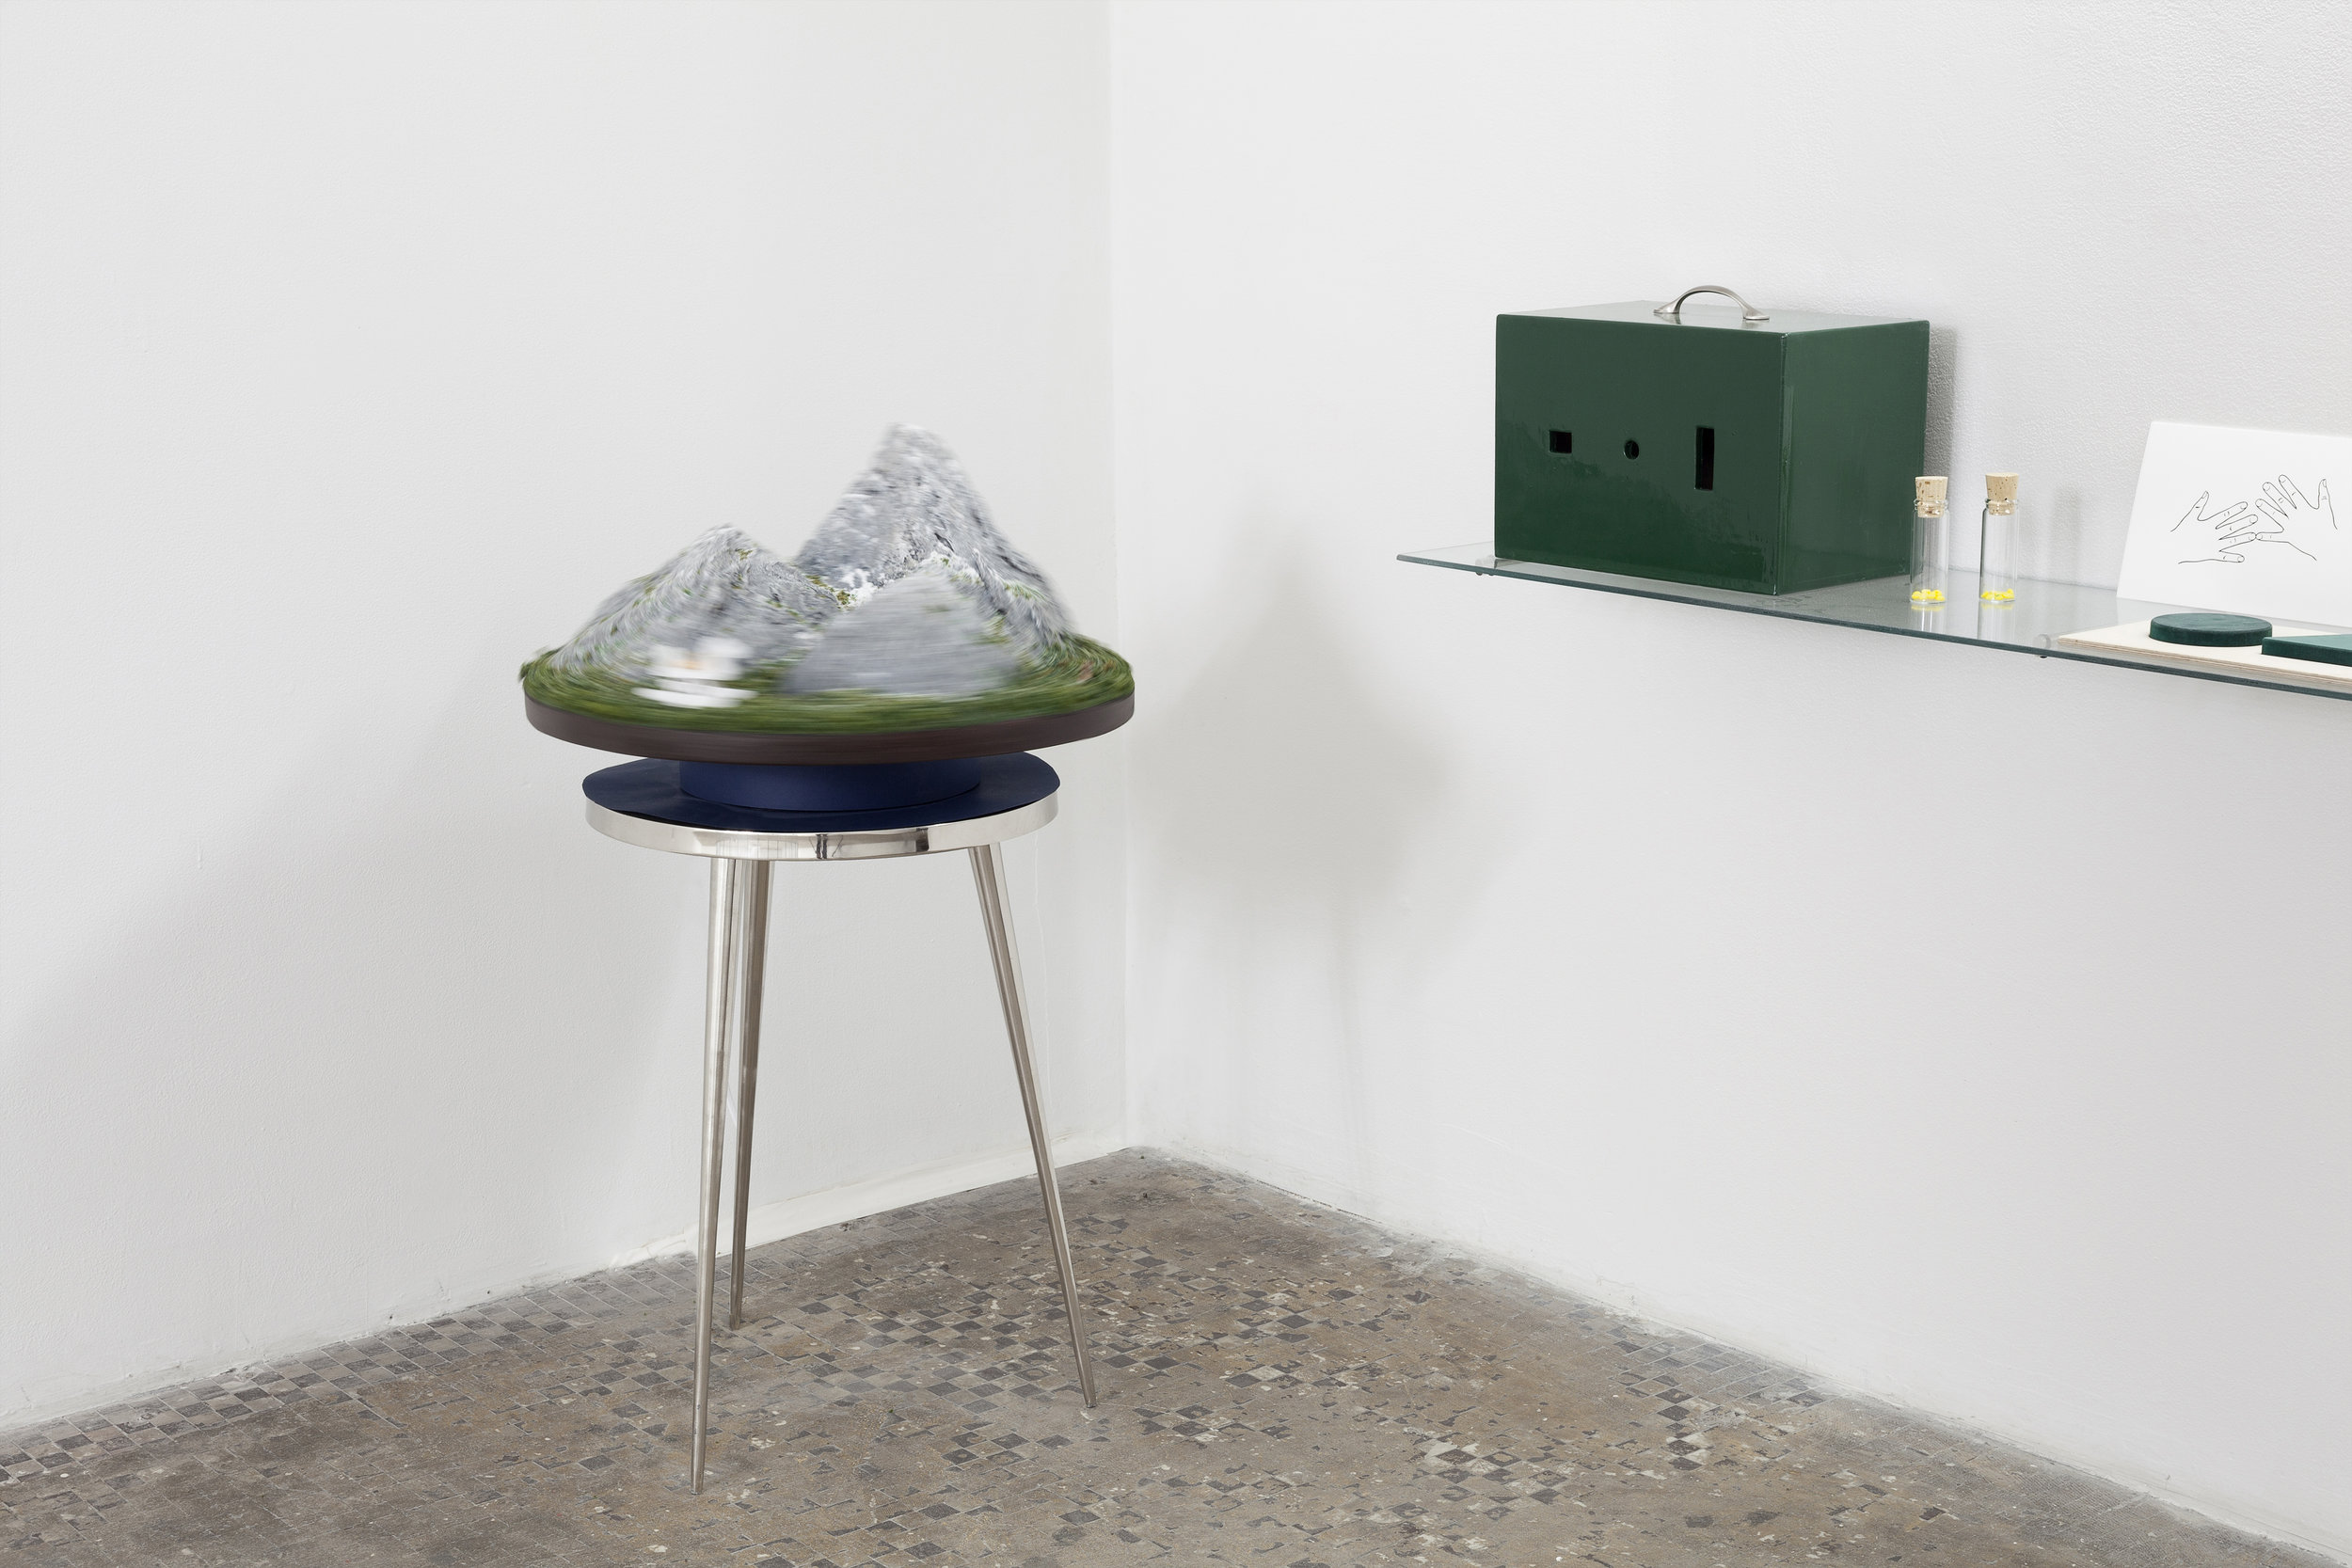 Three Mountain Problem (After Piaget and Inhelder),  2019, Photo: Gustavo Murillo Fernández-Valdés